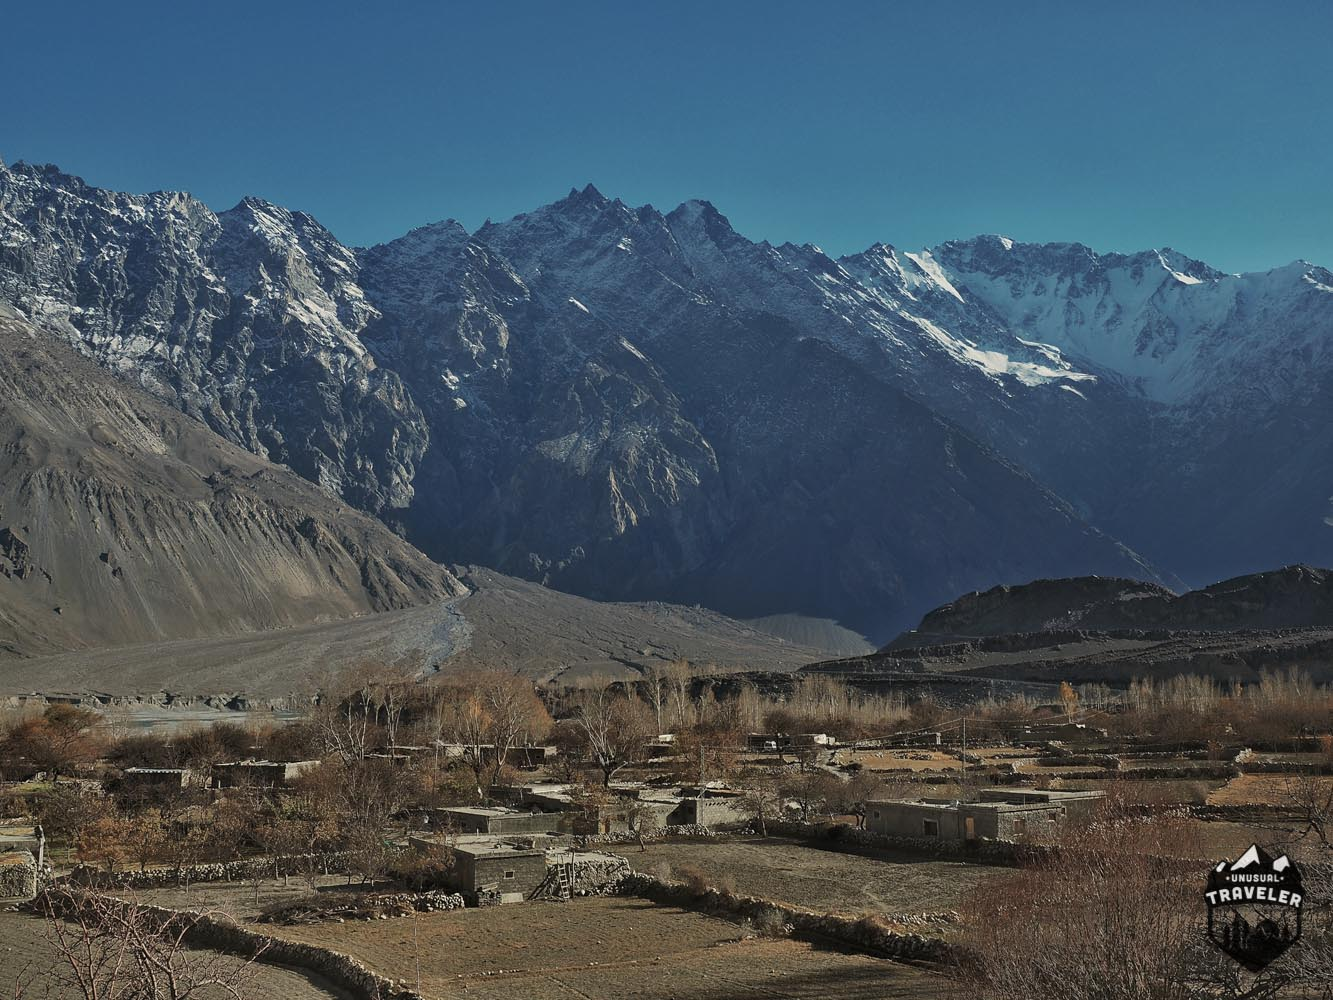 Mountain Scenery on the Karakoram Highway